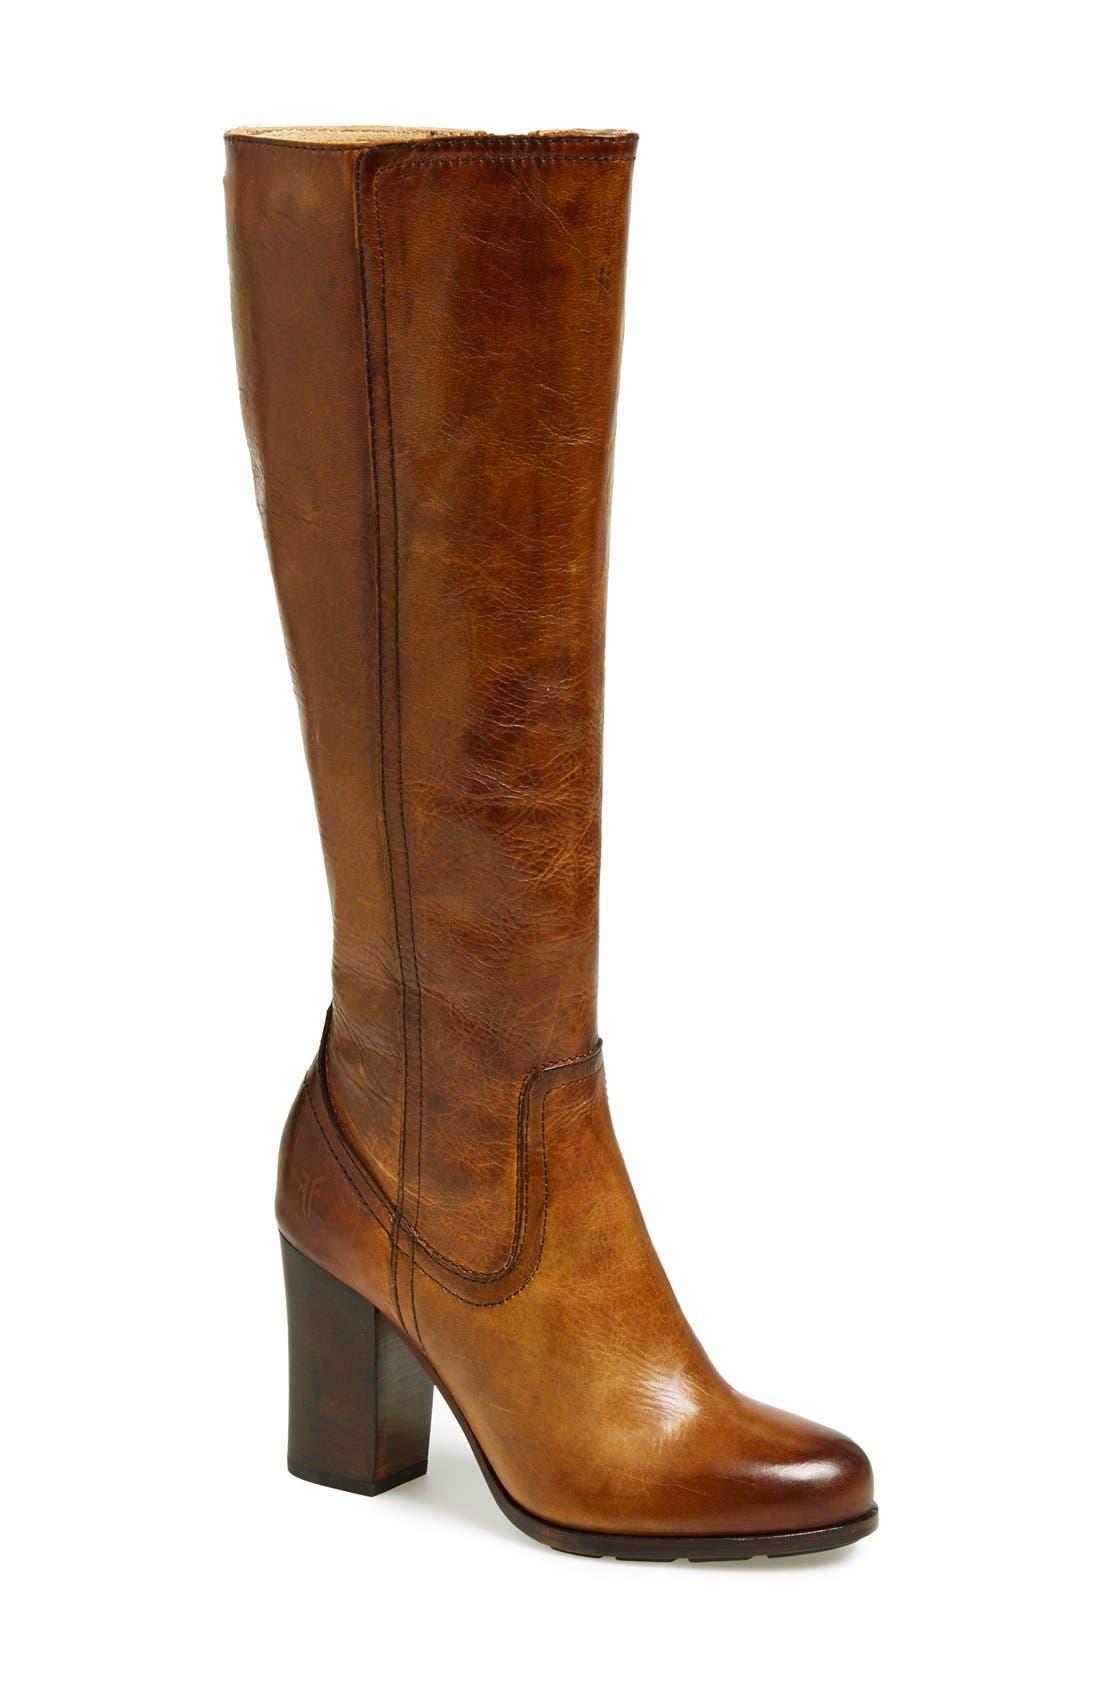 Main Image - Frye 'Parker' Tall Boot (Women)